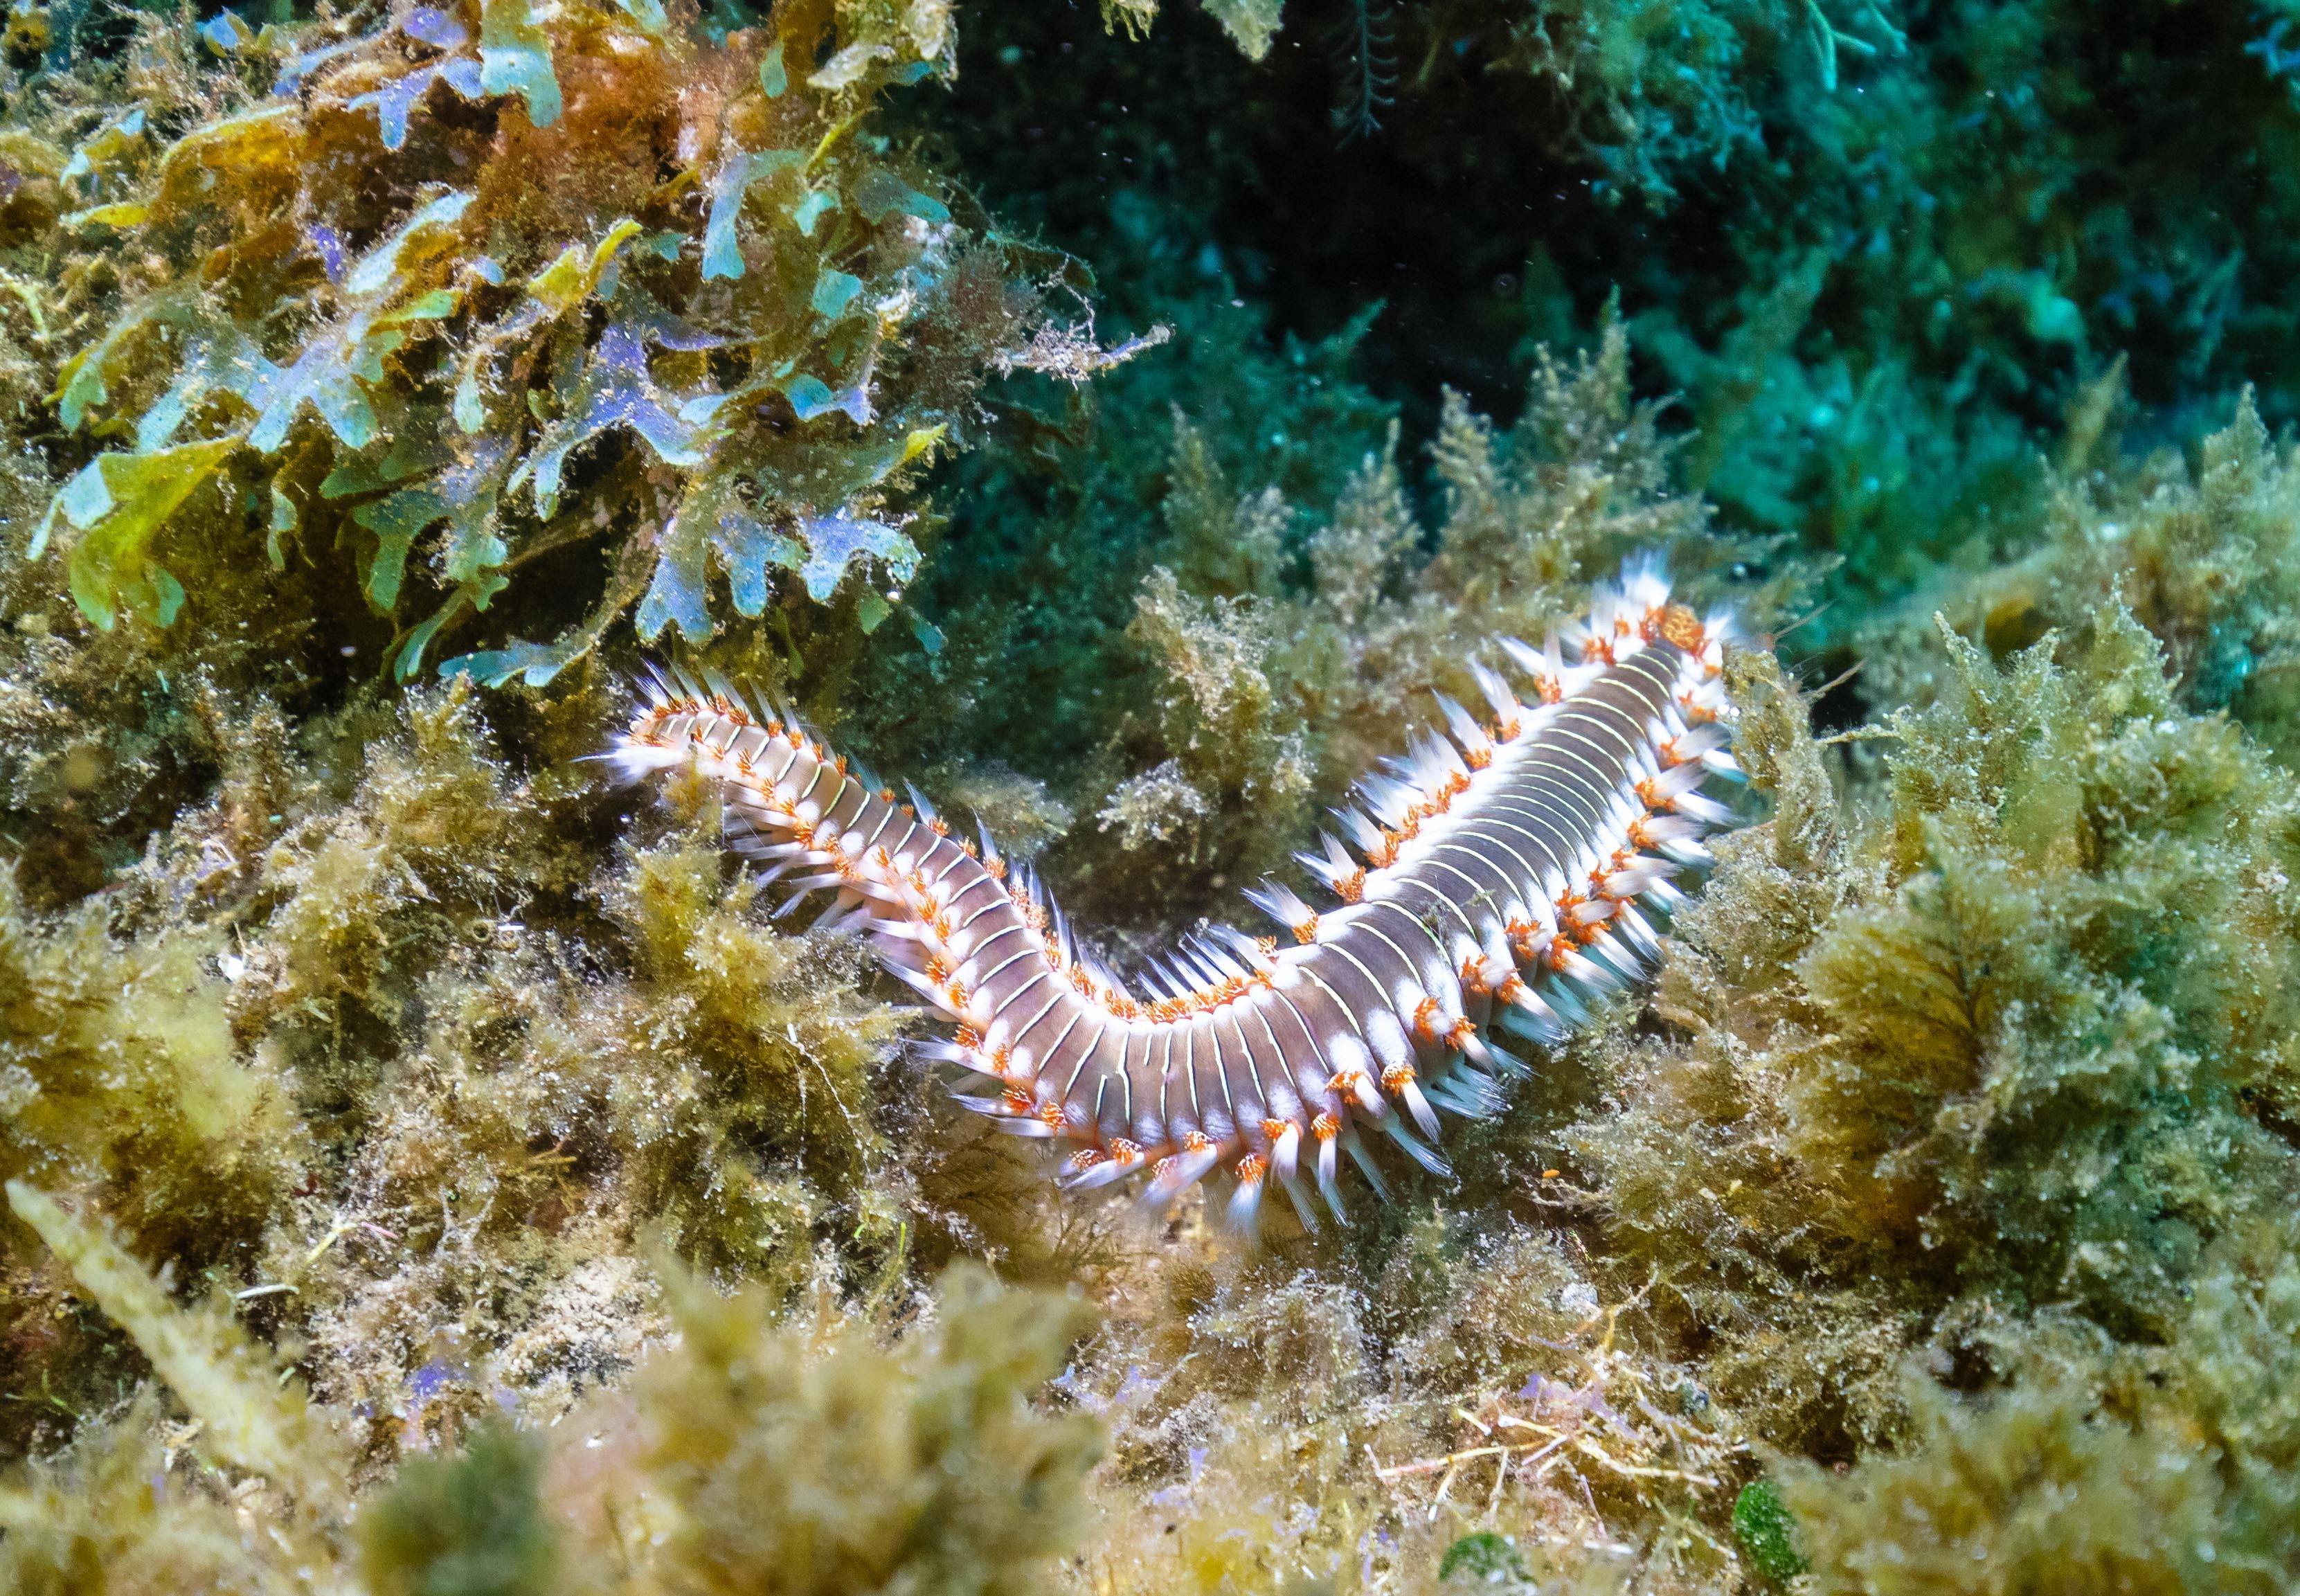 Fire worm (Hermodice carunculata), Madeira, Portugal.